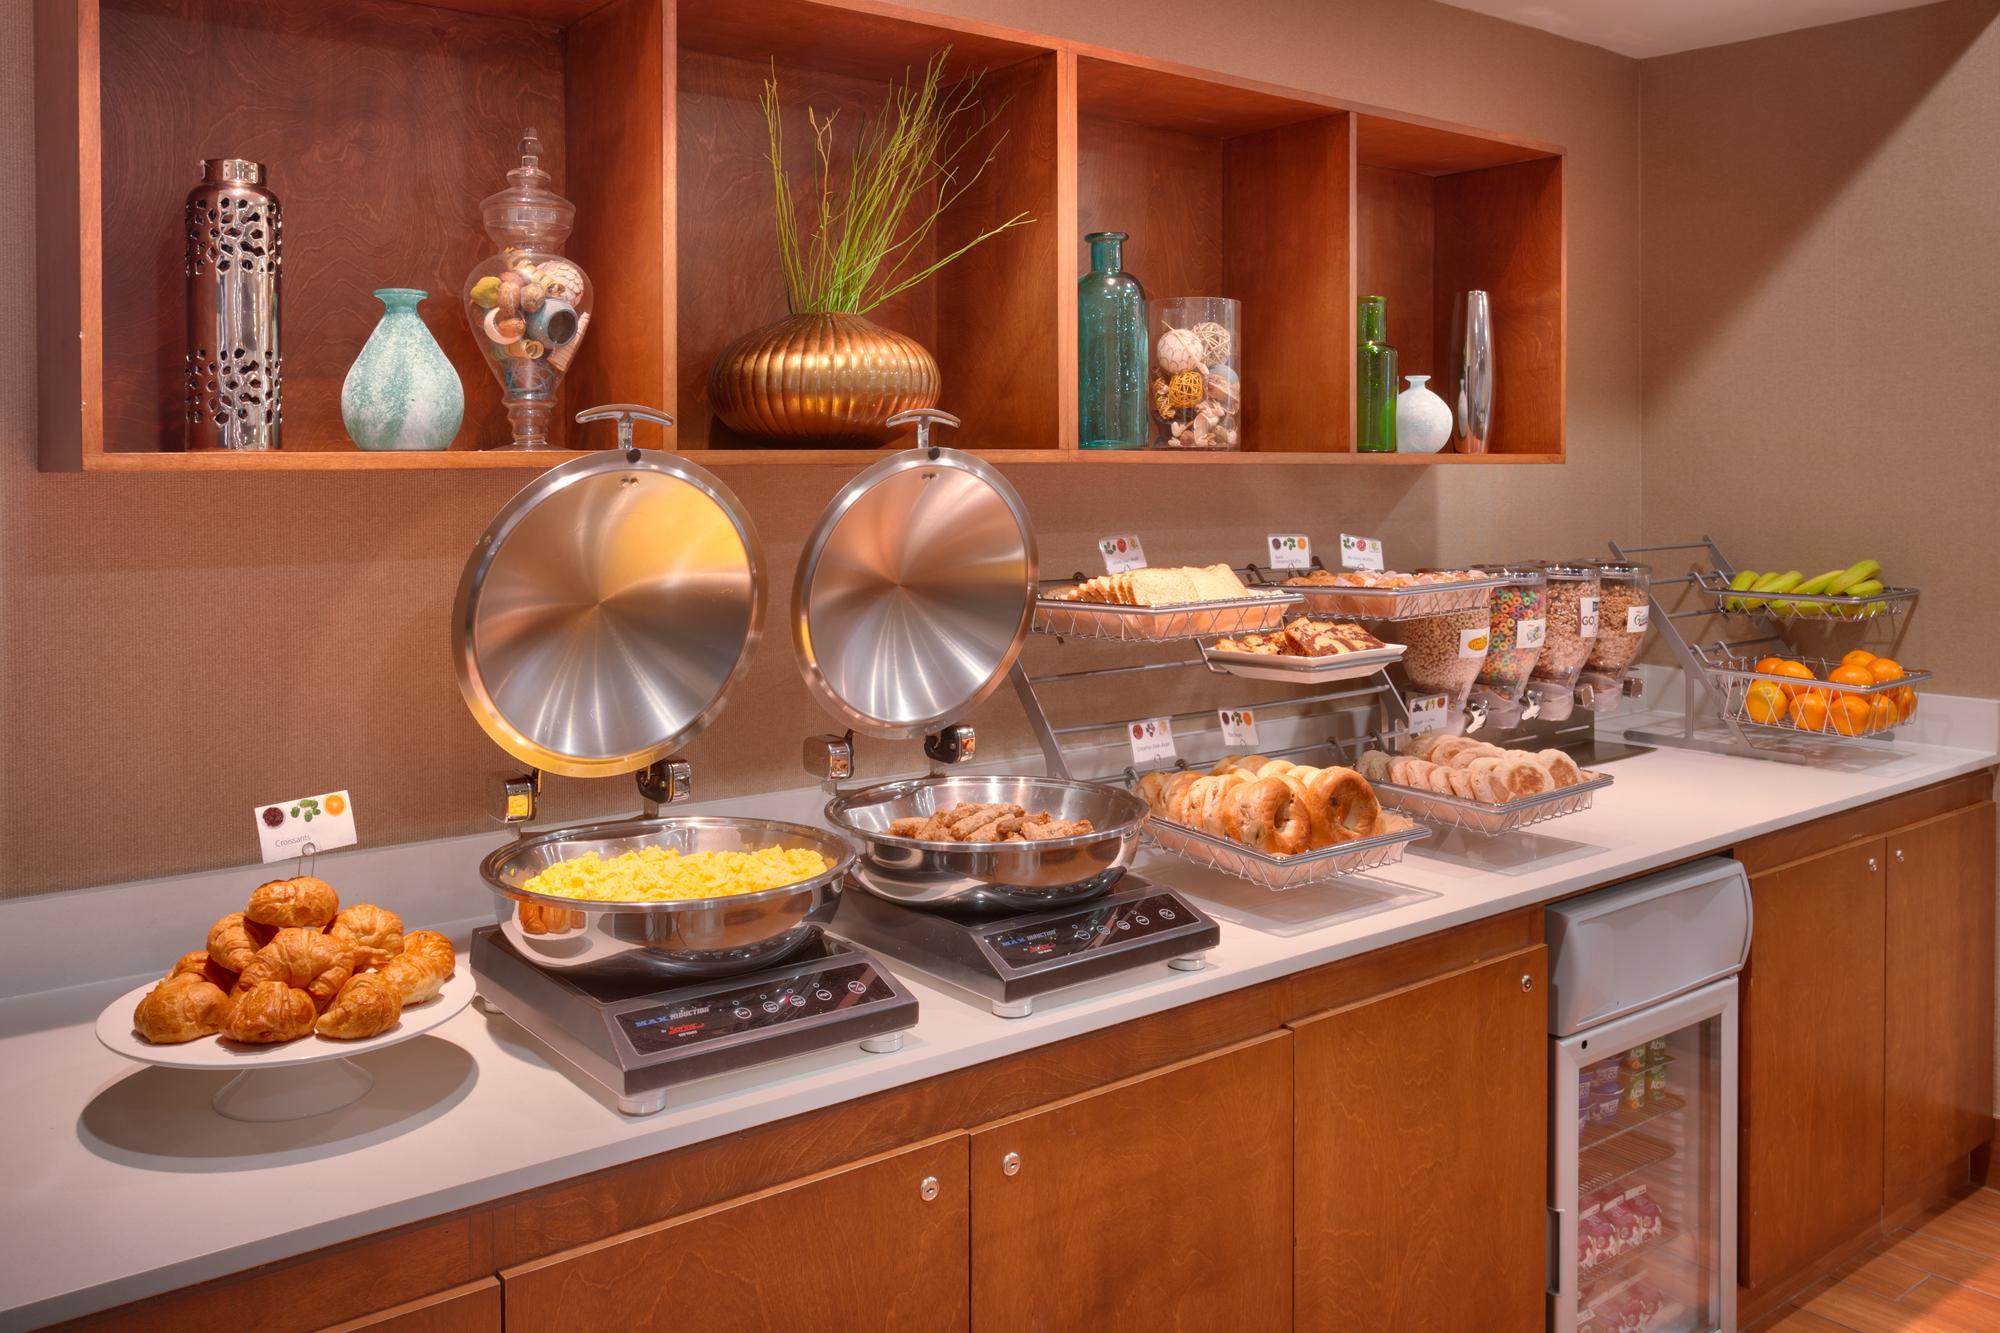 SpringHill Suites by Marriott Pasadena Arcadia image 11